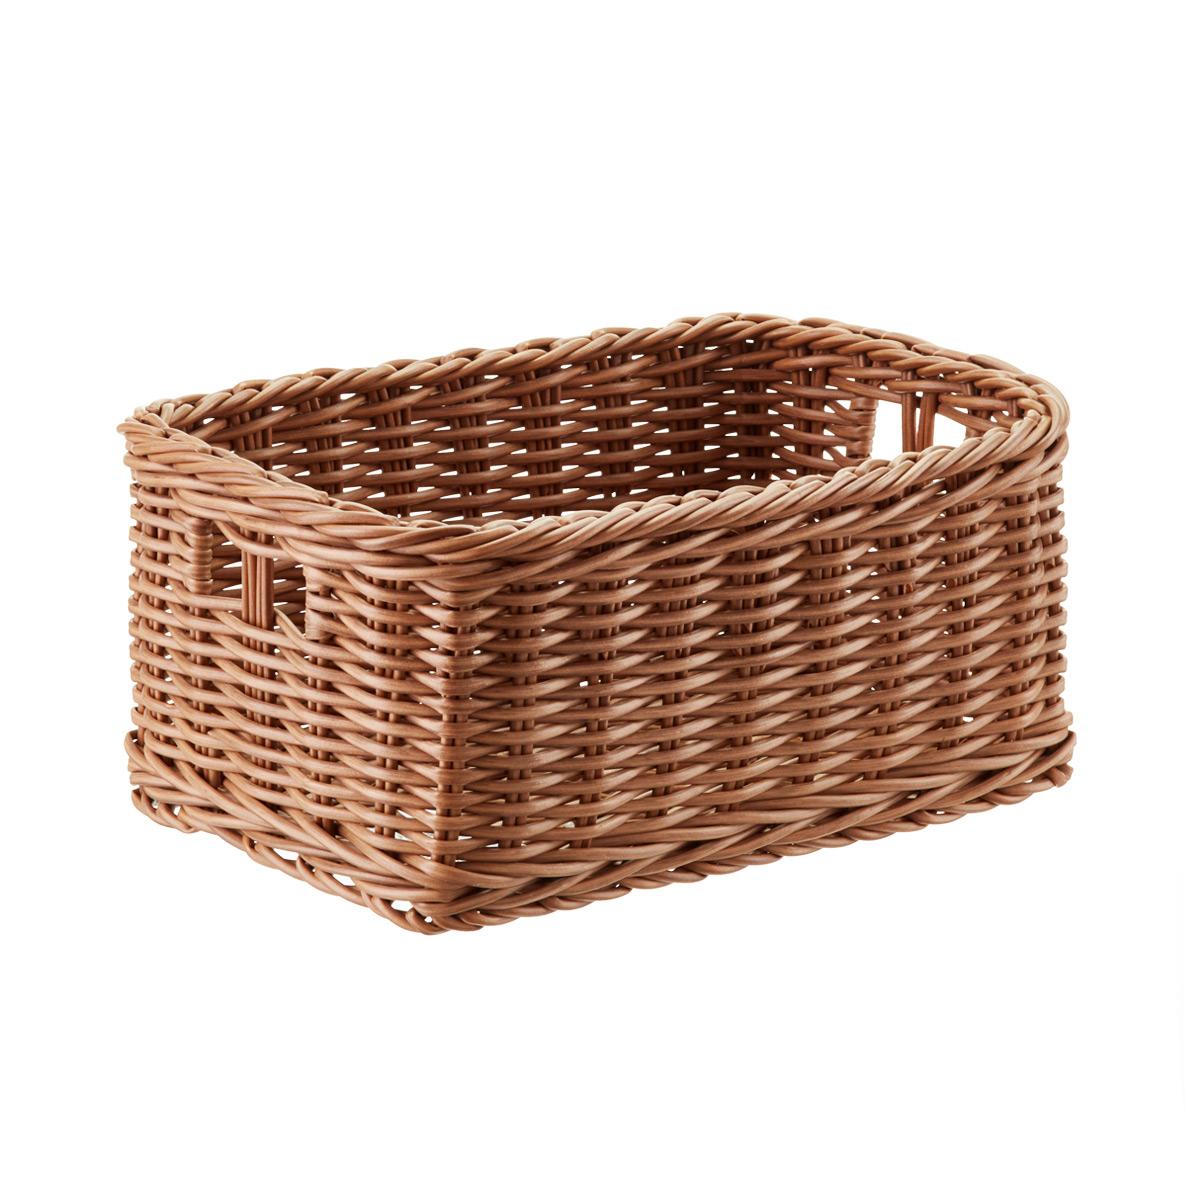 Trending Plastic Wicker Storage Bin with Handles wicker storage baskets